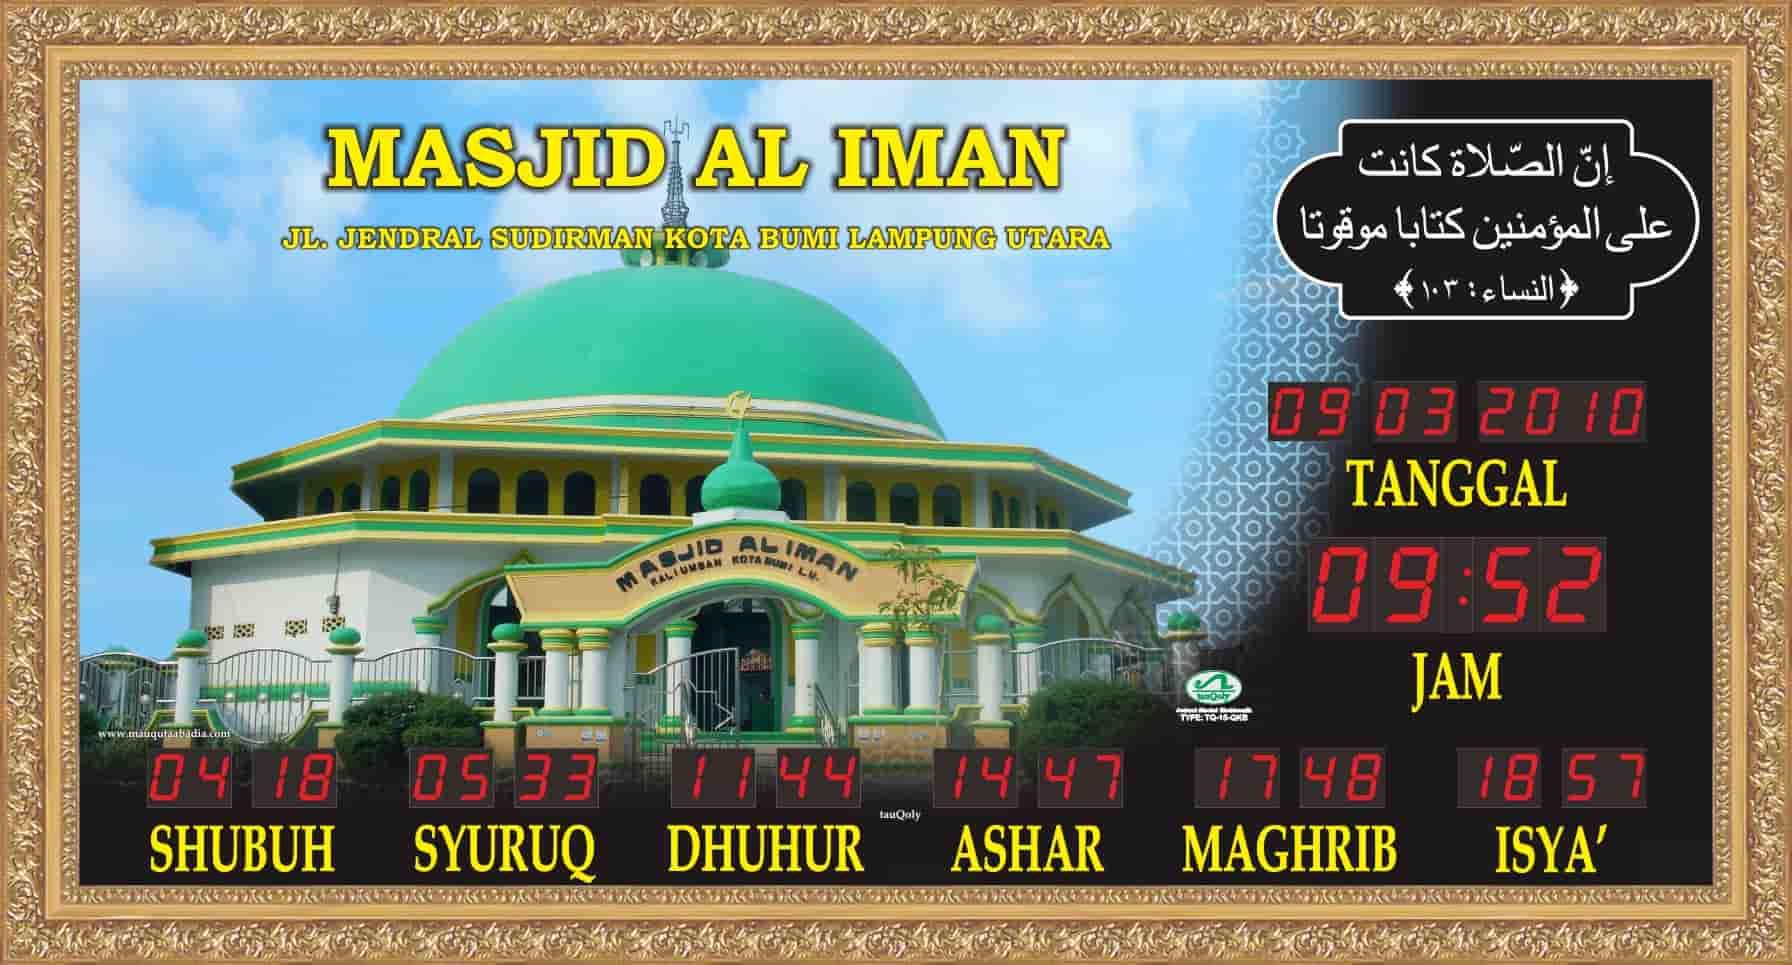 jam-digital-untuk-masjid-tq-15-qfk-67x127